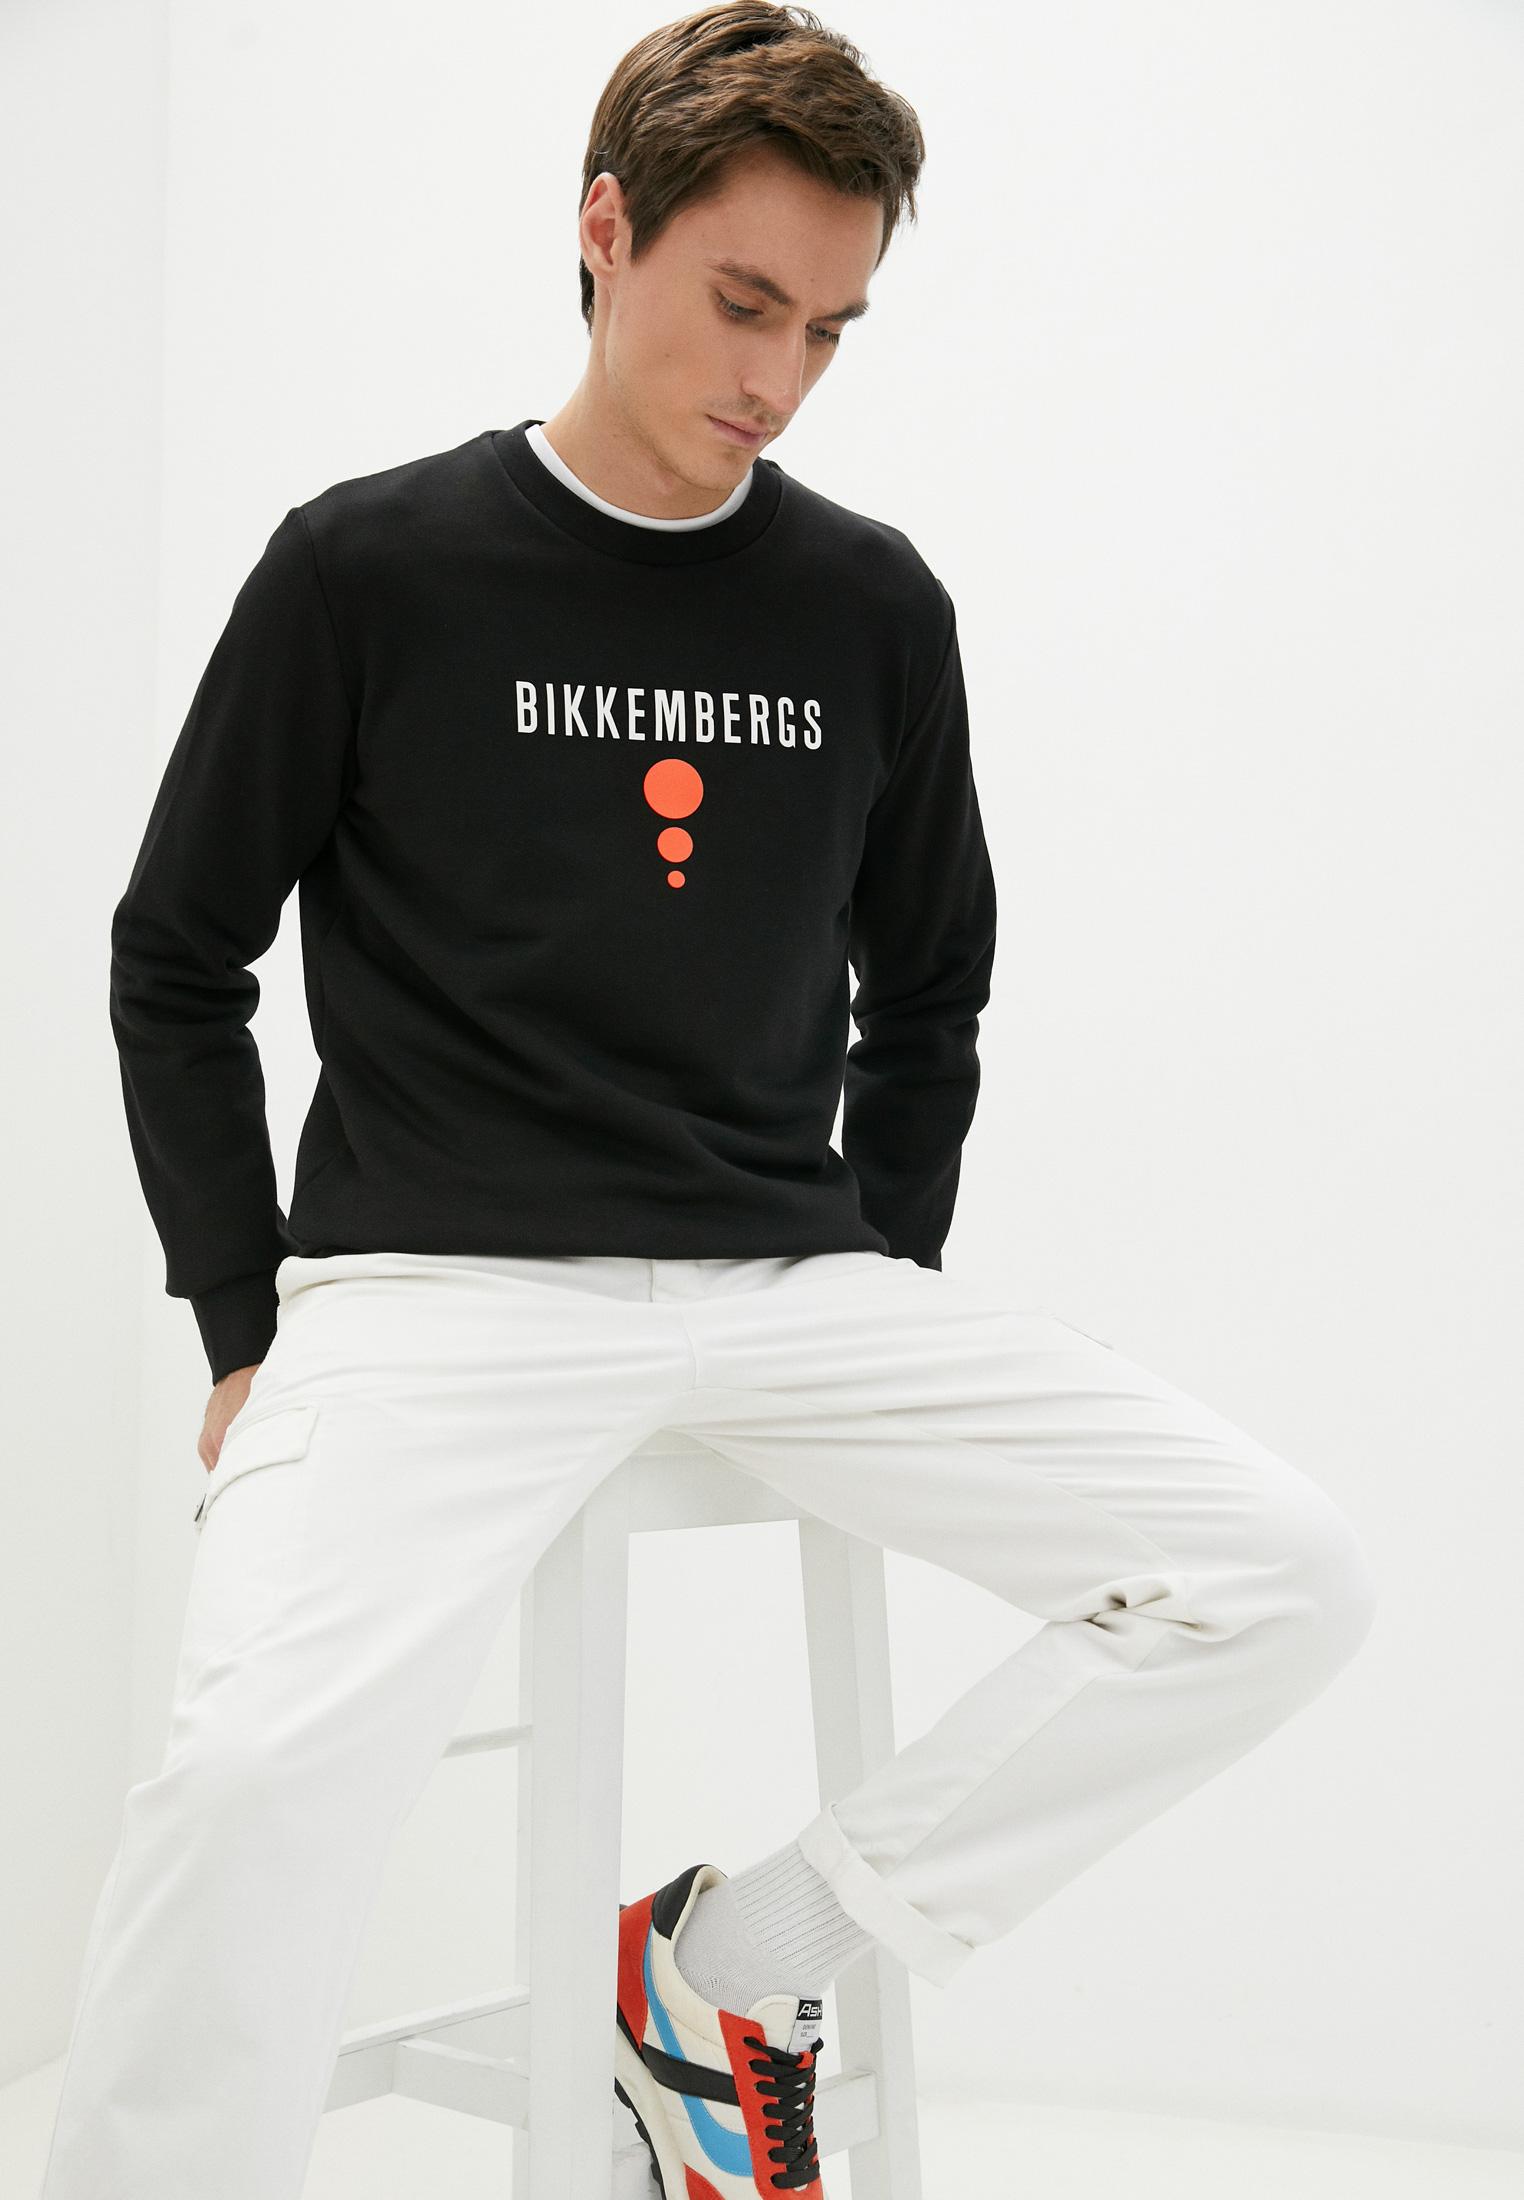 Мужская толстовка Bikkembergs (Биккембергс) C 6 150 8W M 3875